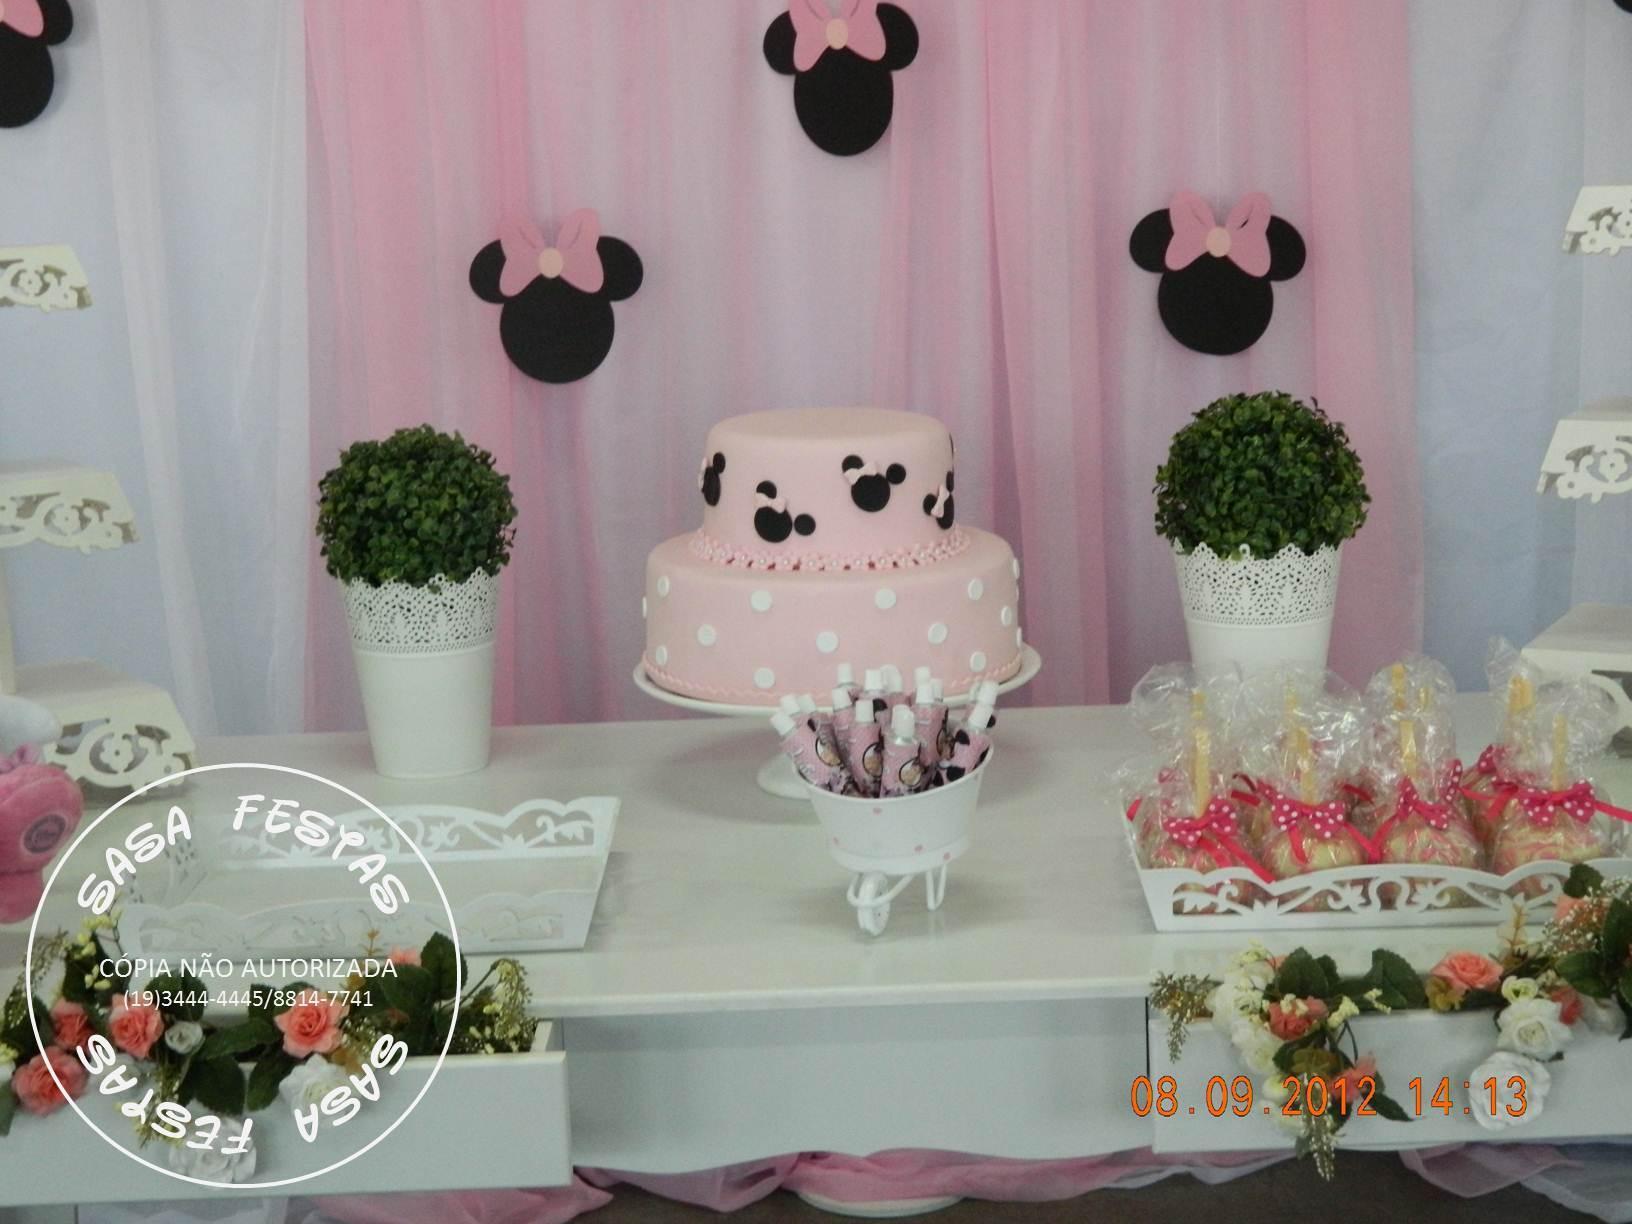 decoracao festa minnie rosa : decoracao festa minnie rosa:decoracao minnie rosa decoracao minnie rosa decoracao minnie rosa